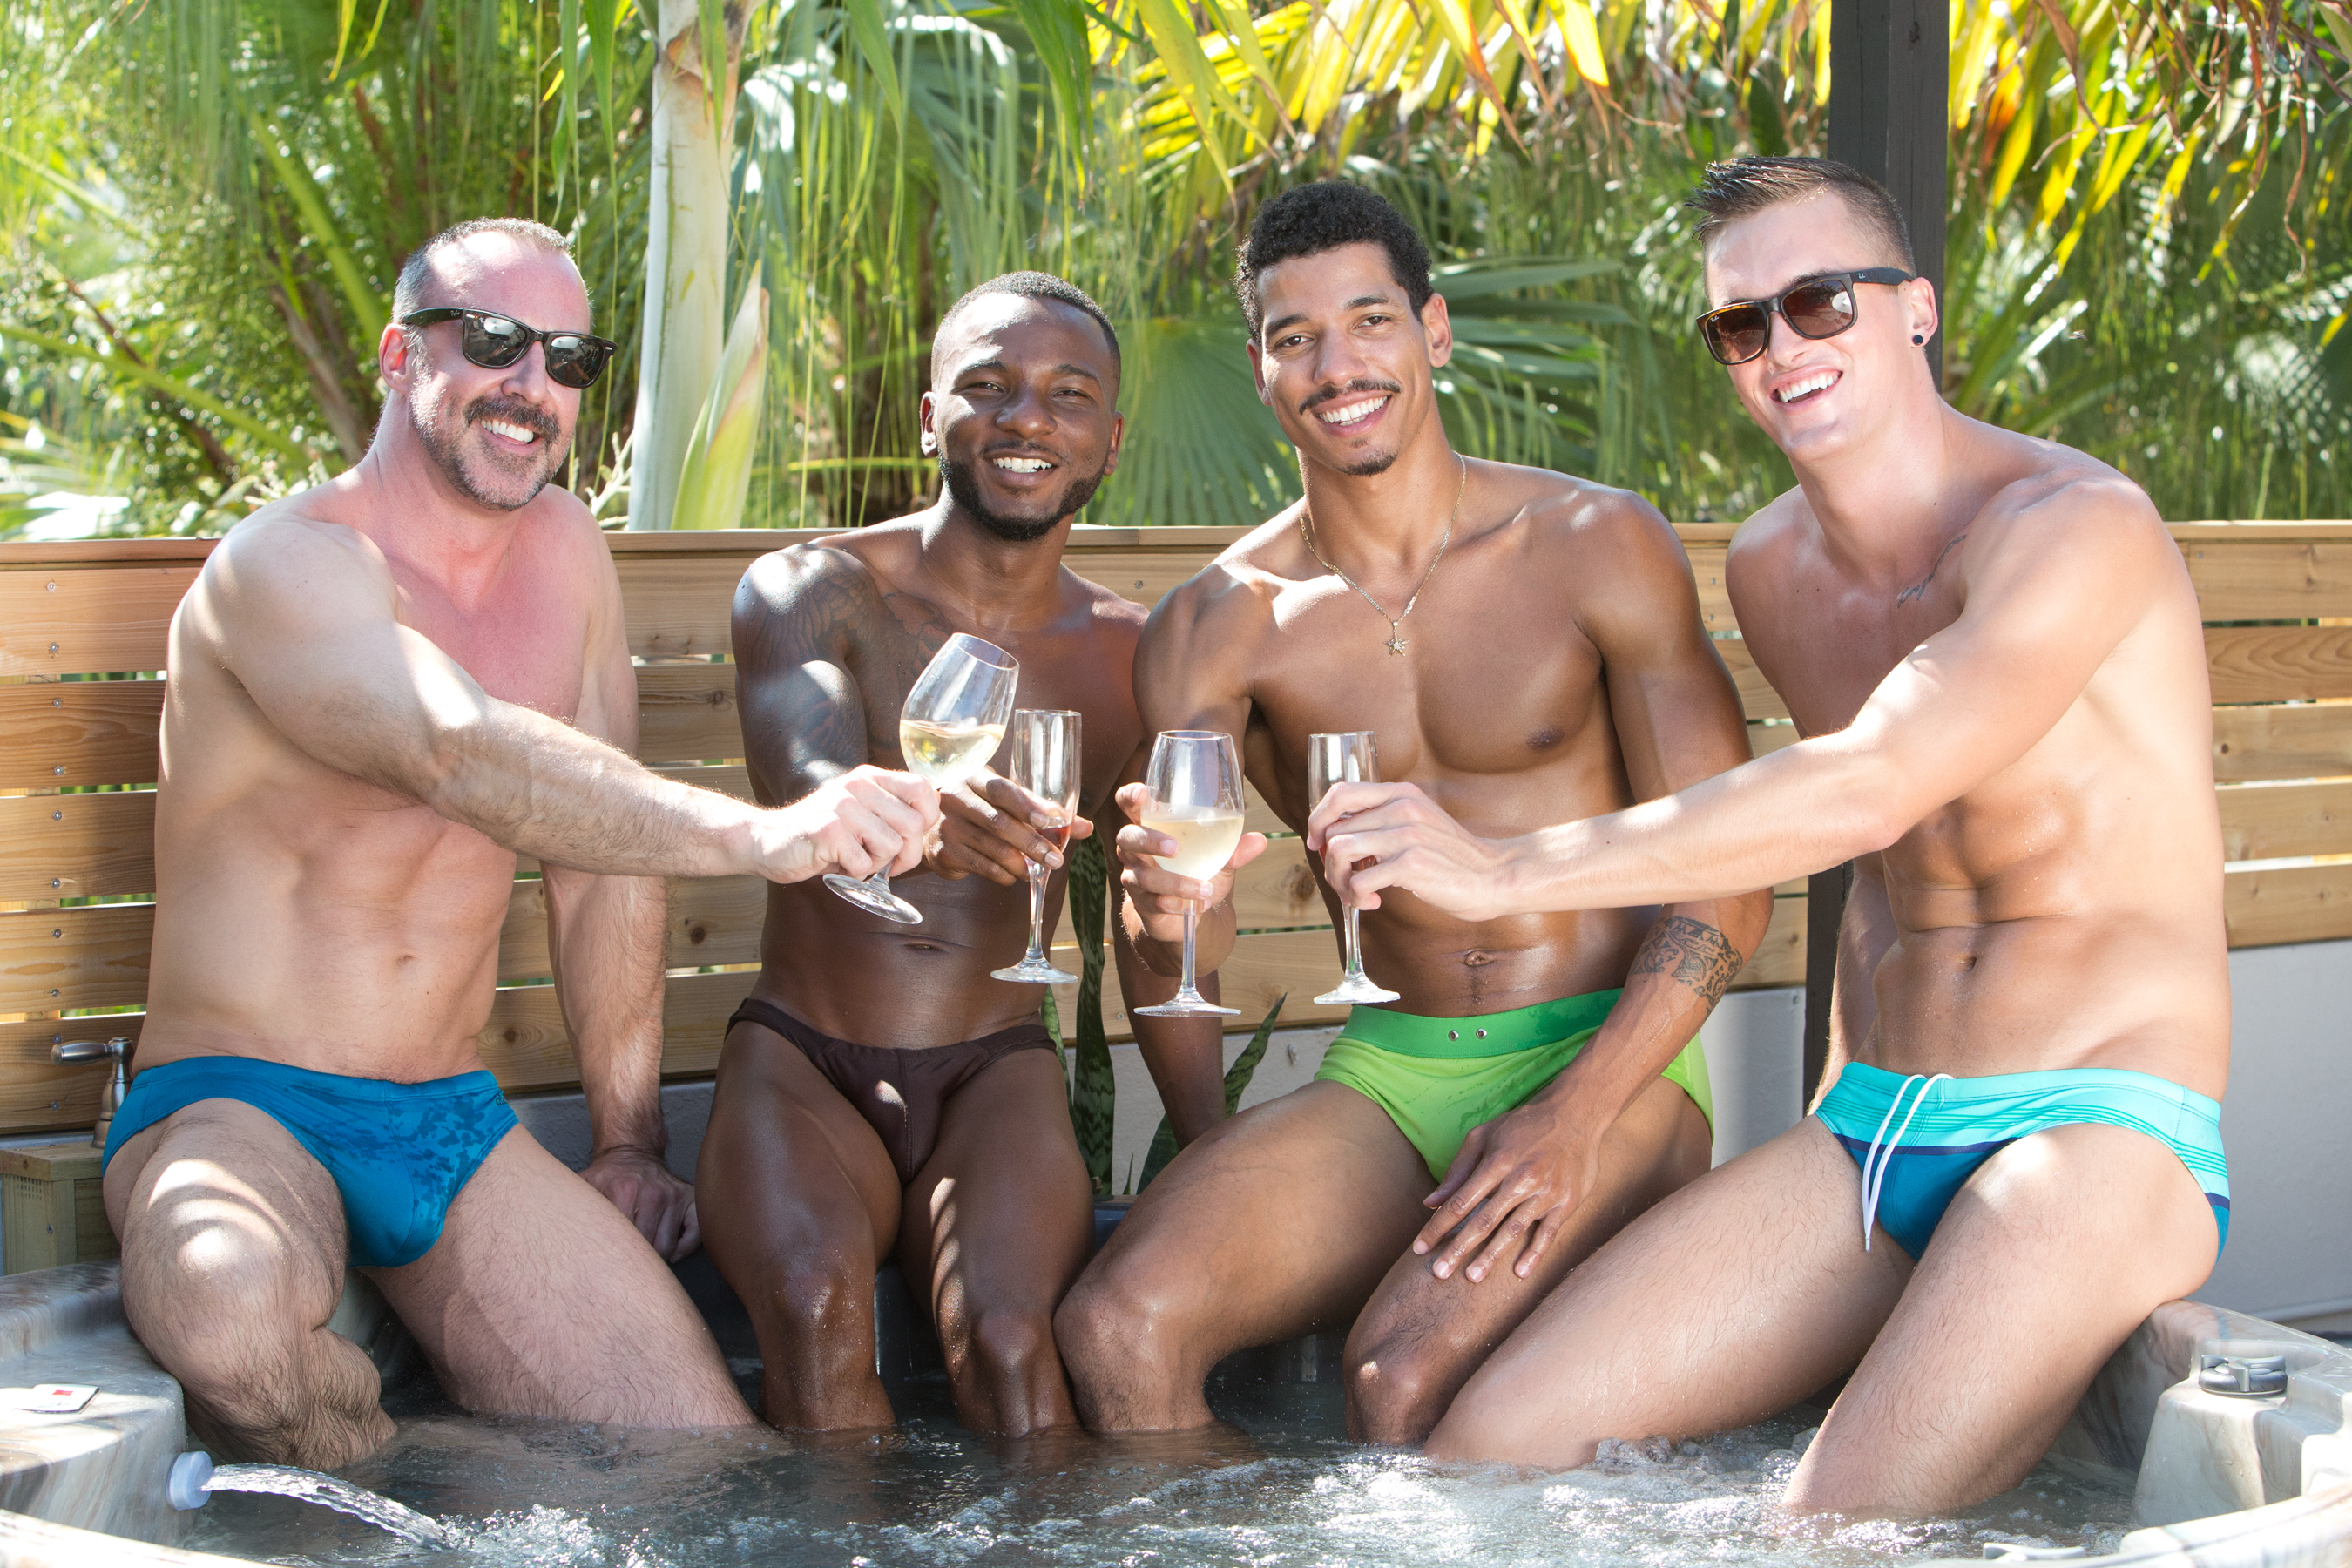 Gay guys in a hot tub